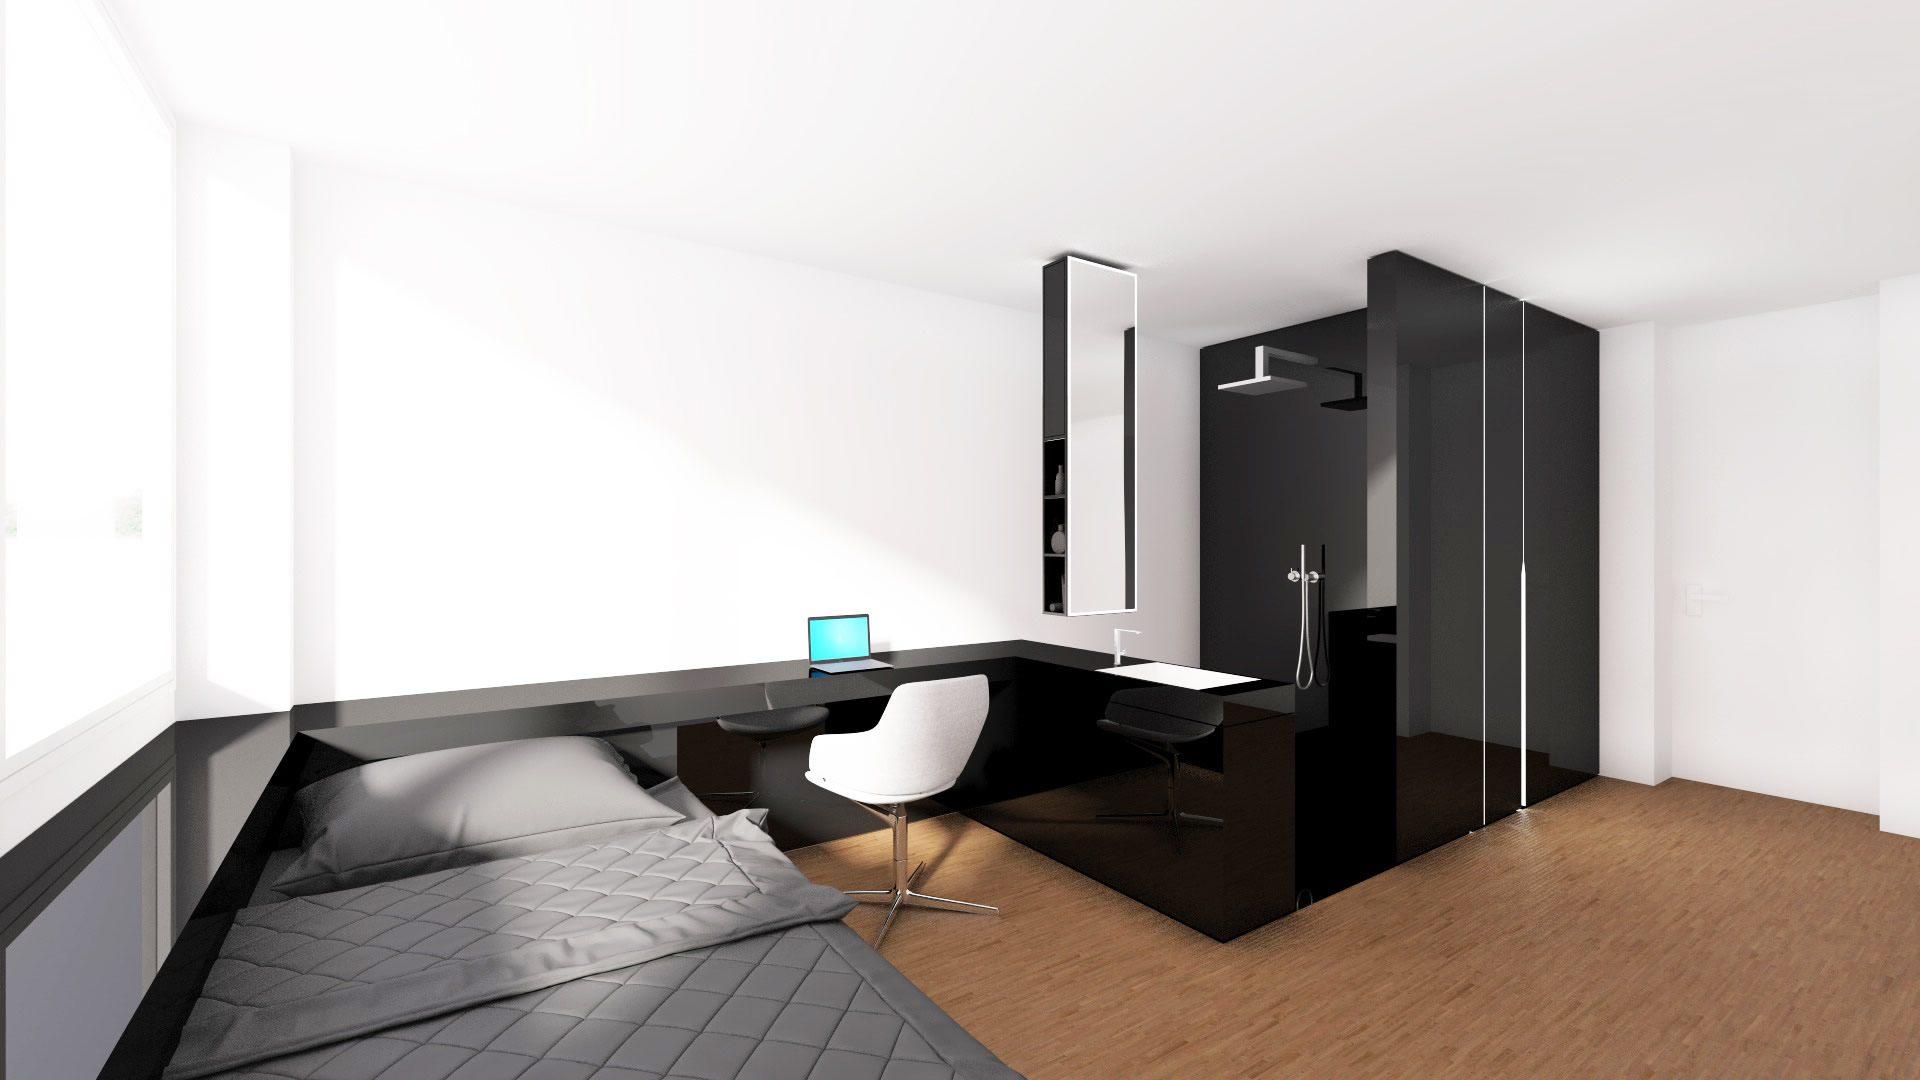 whocares_design_hotel_material (5).jpg